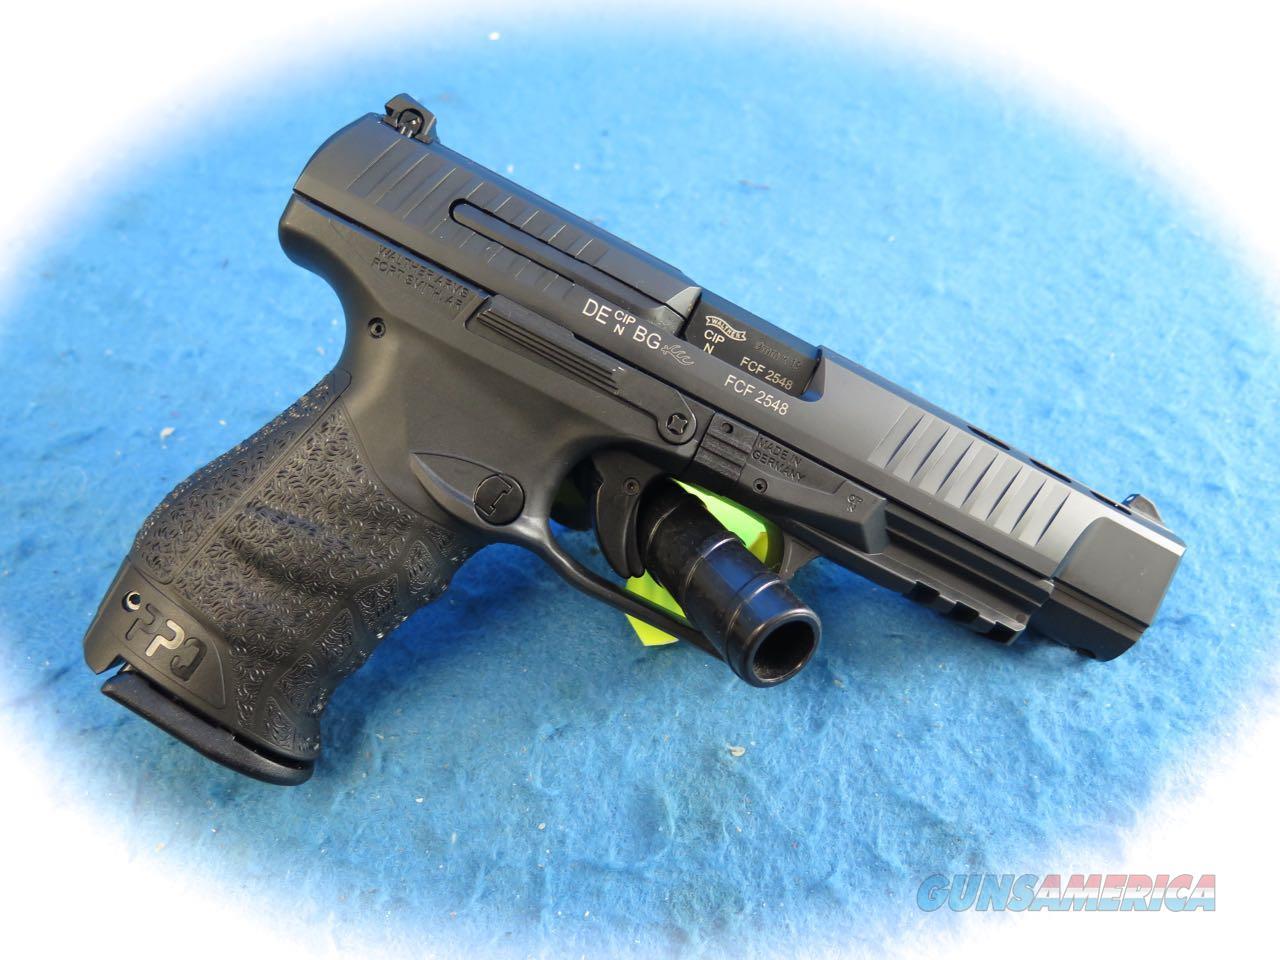 Walther PPQ M2 9mm Semi Auto Pistol Model 2796091 **New**  Guns > Pistols > Walther Pistols > Post WWII > P99/PPQ